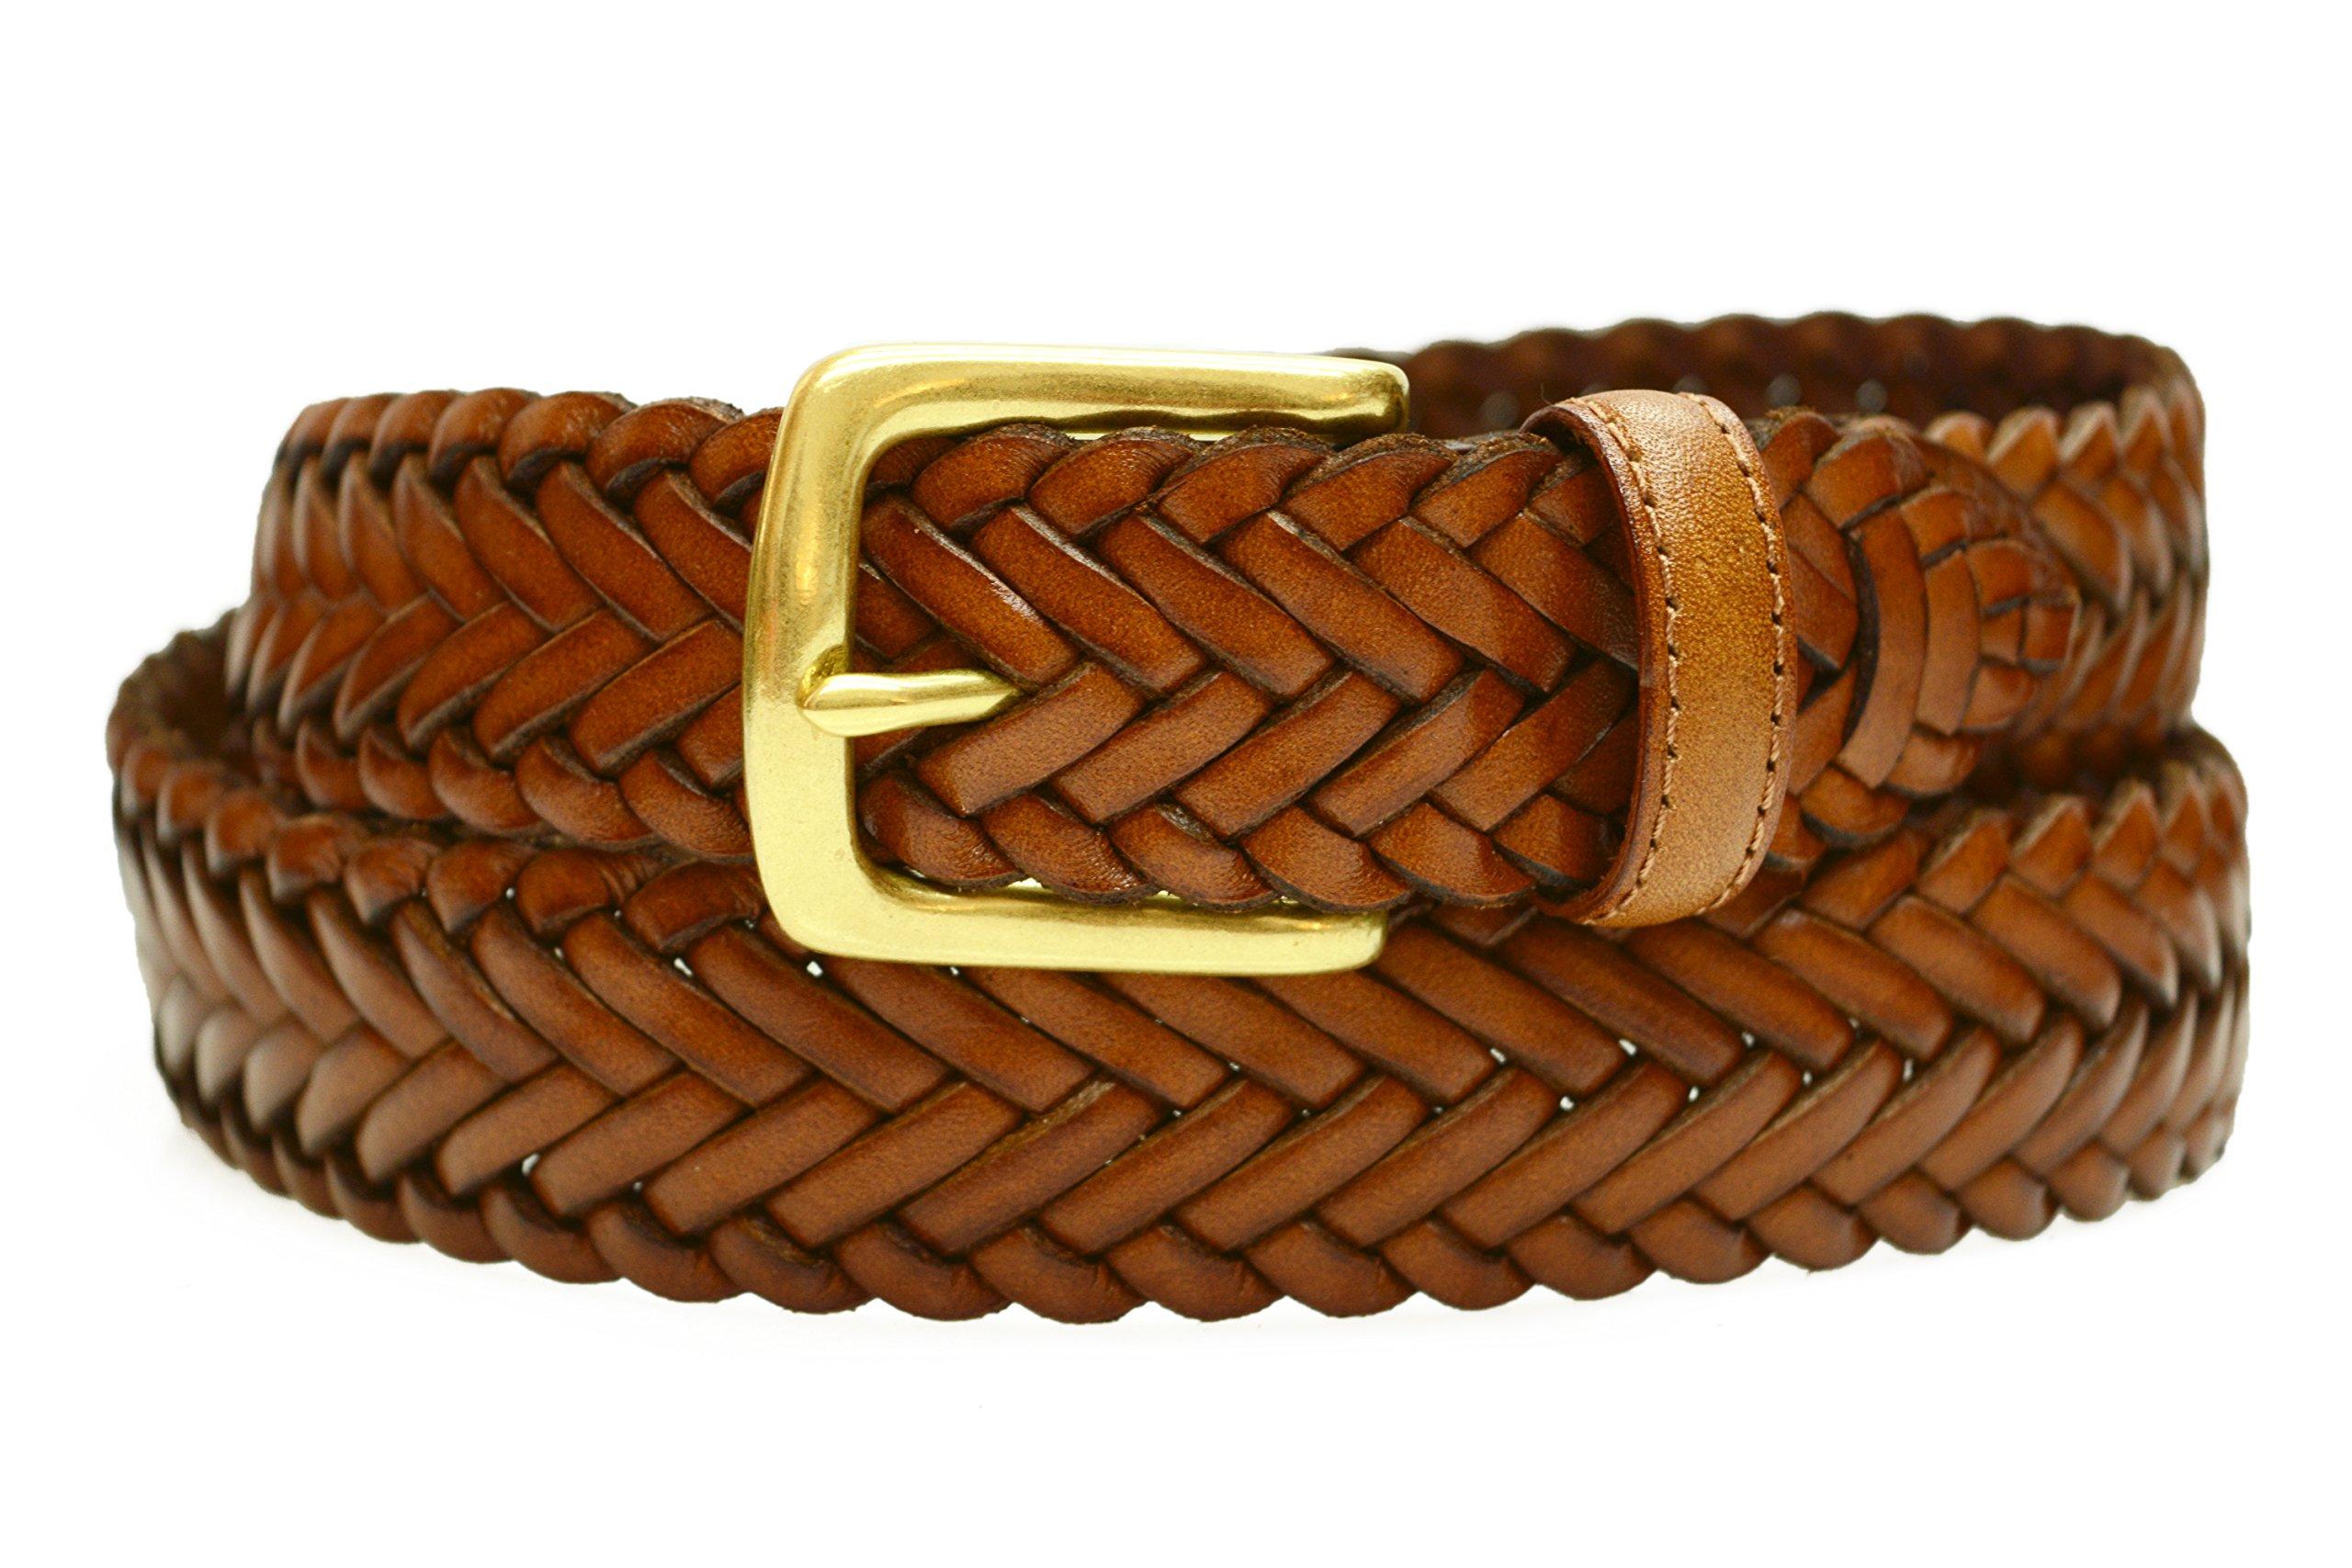 796-TAN - Toneka Men's Woven Tan Caramel Full grain Braided Leather Dress Belt (34)